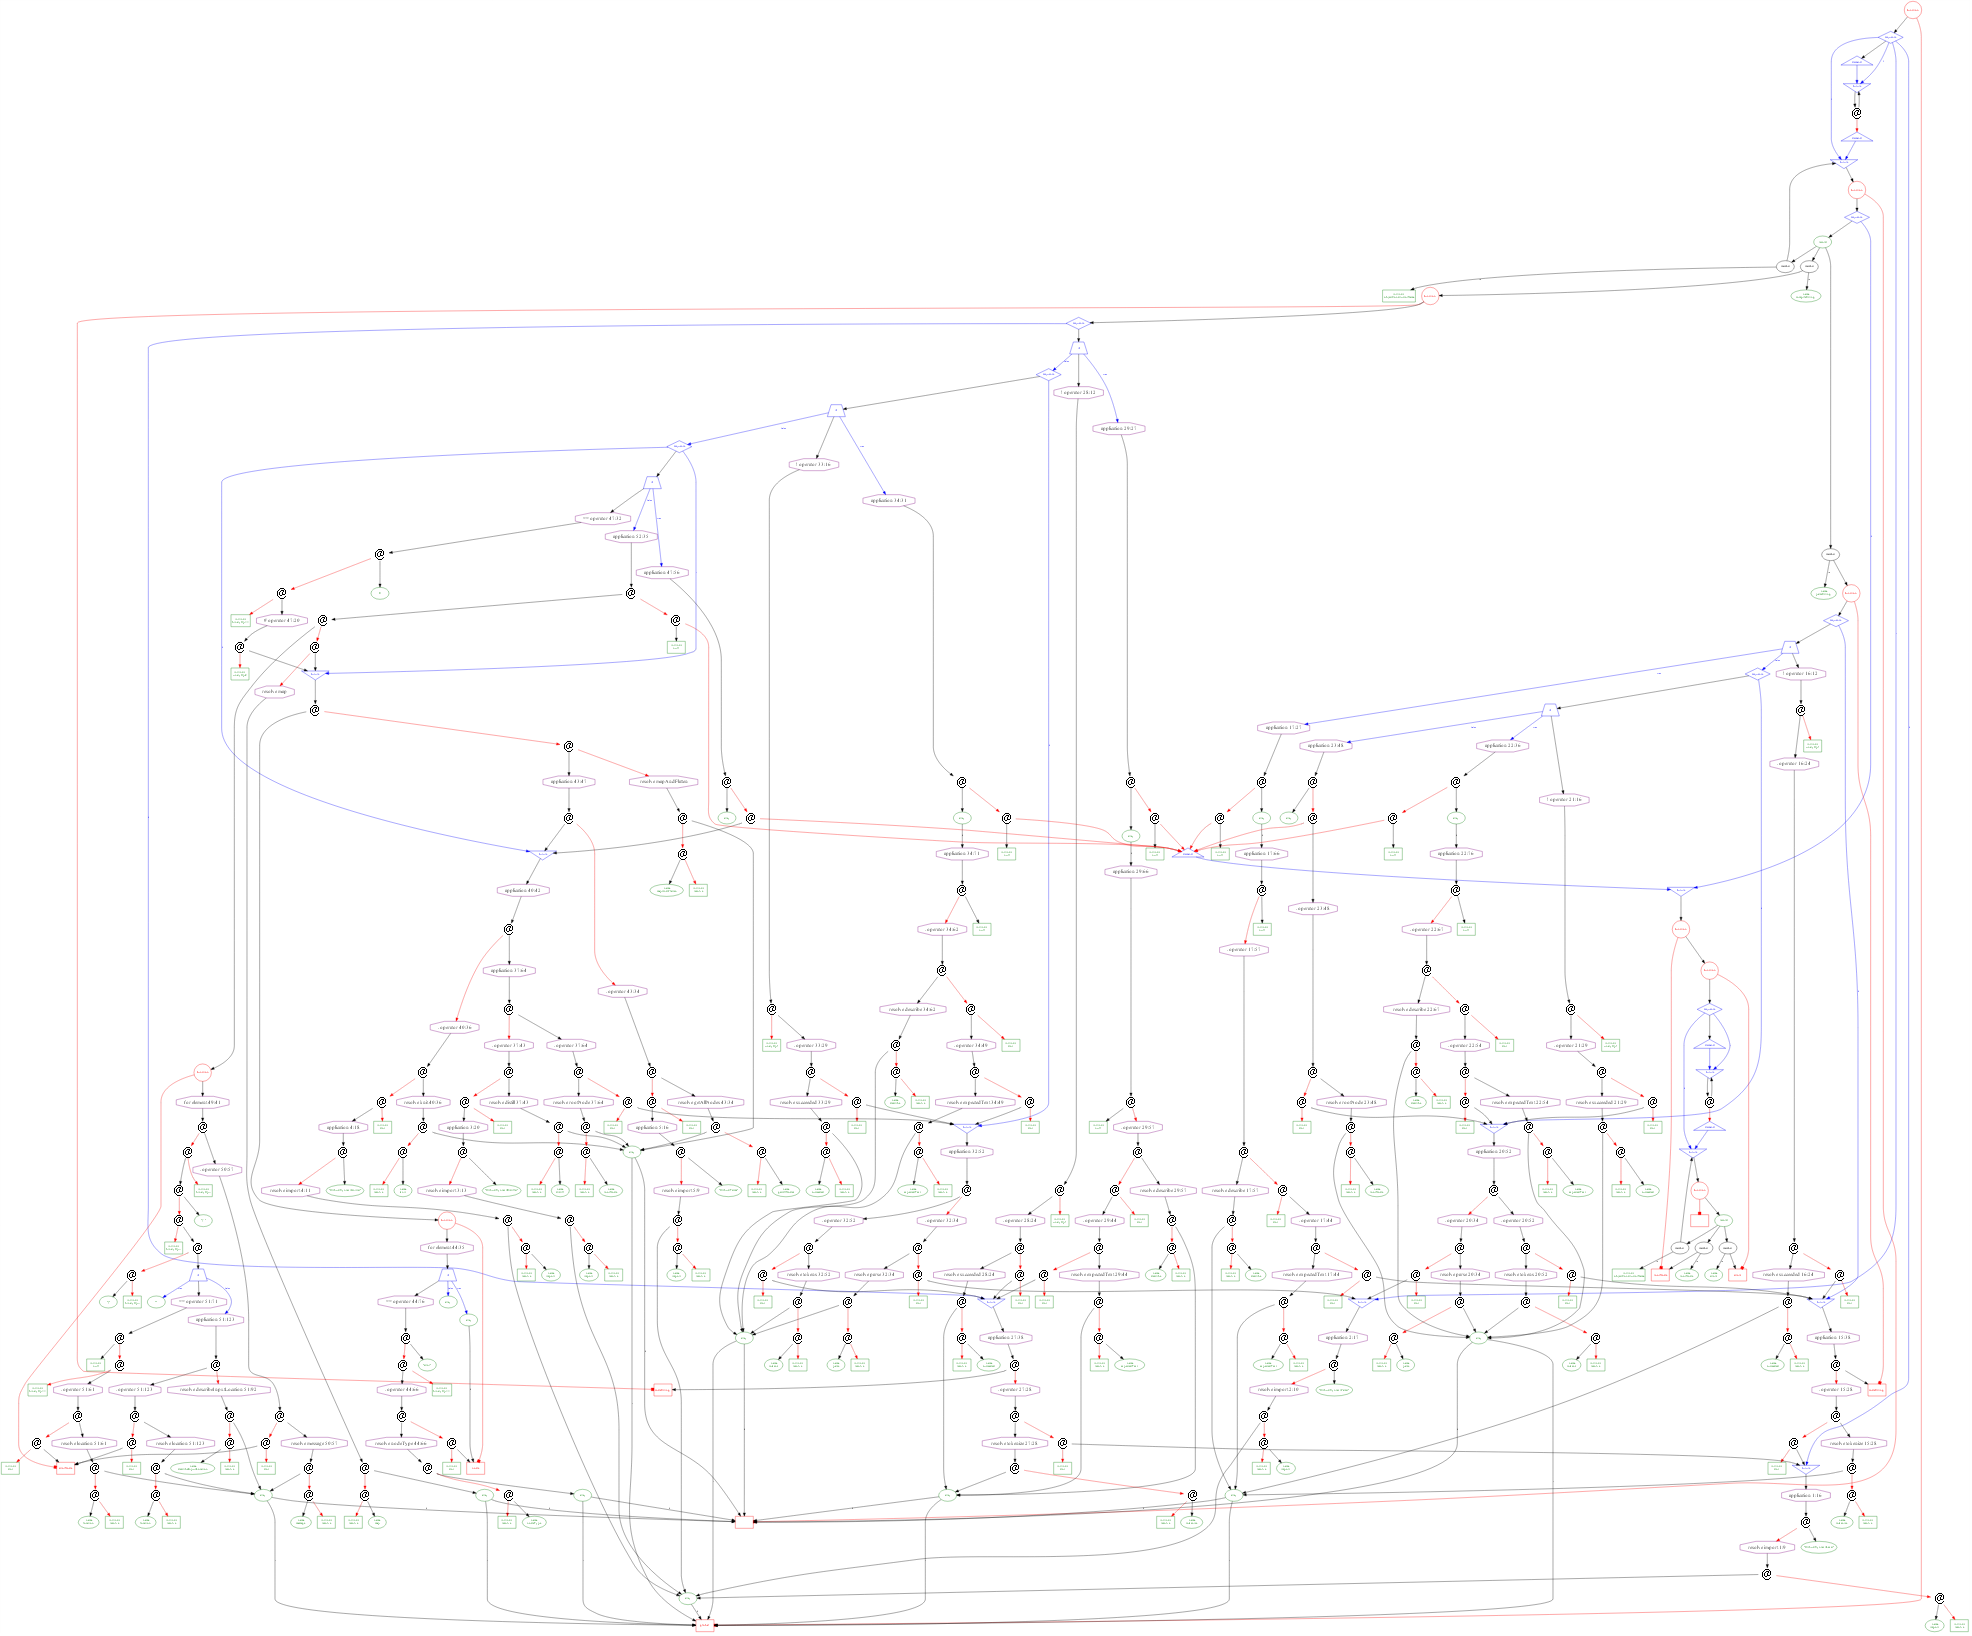 SYMBL compilation pipeline | Andrew's website